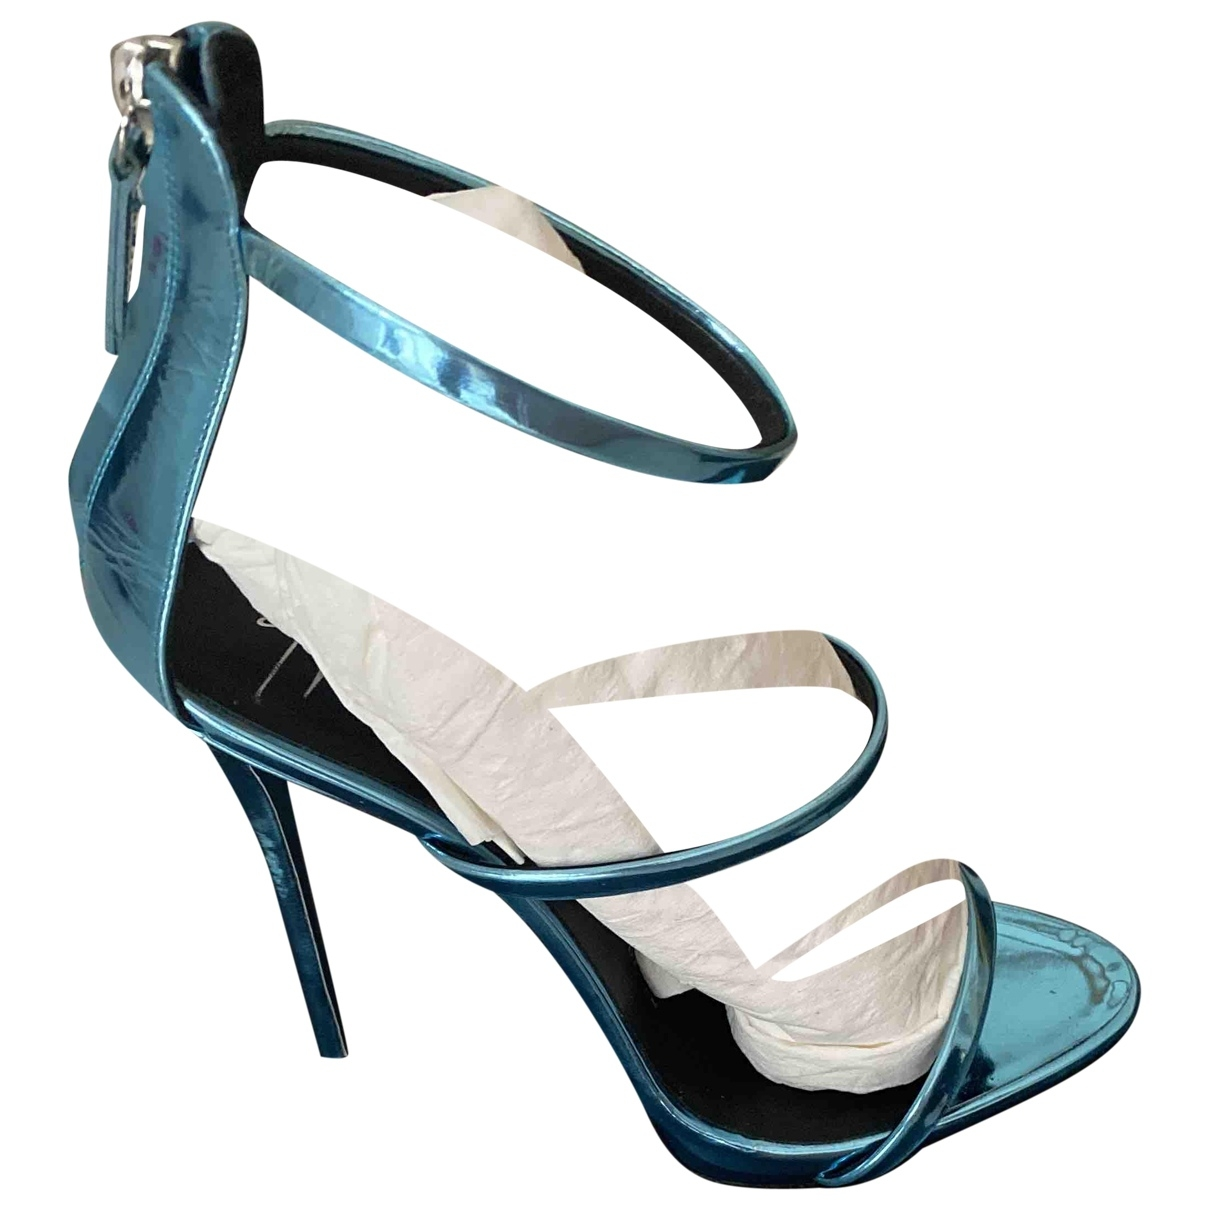 Giuseppe Zanotti - Sandales   pour femme en cuir verni - turquoise